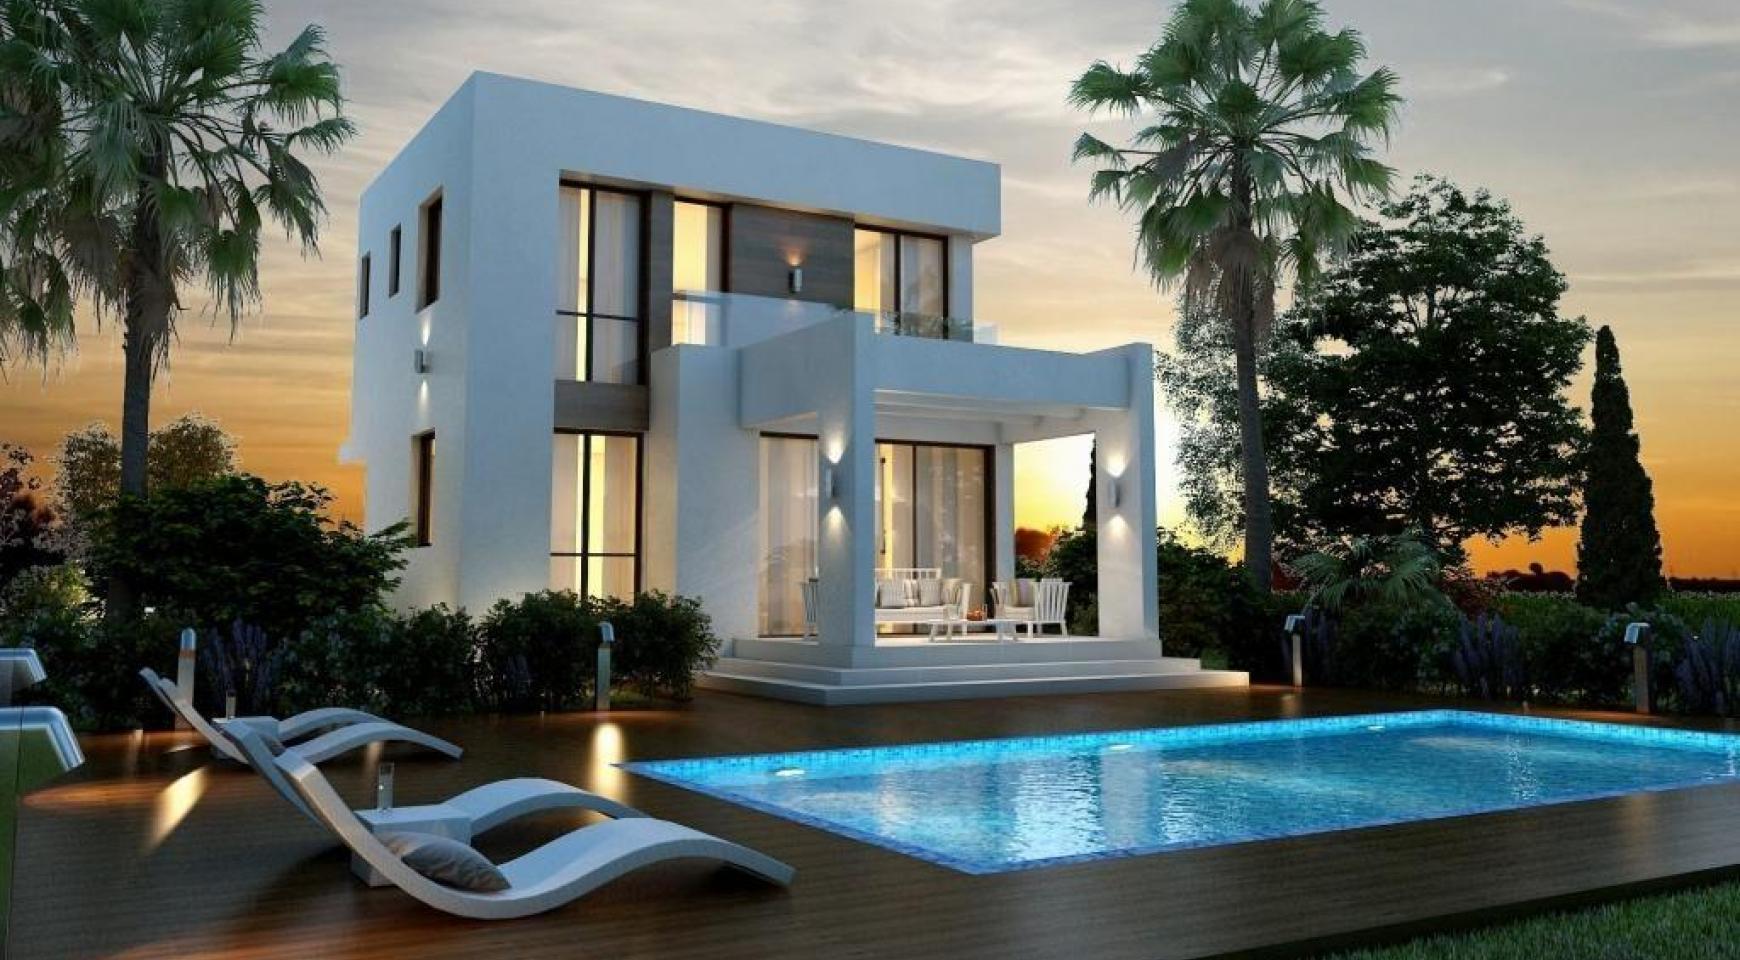 Modern 3 Bedroom Villa in a Complex near the Beach - 2